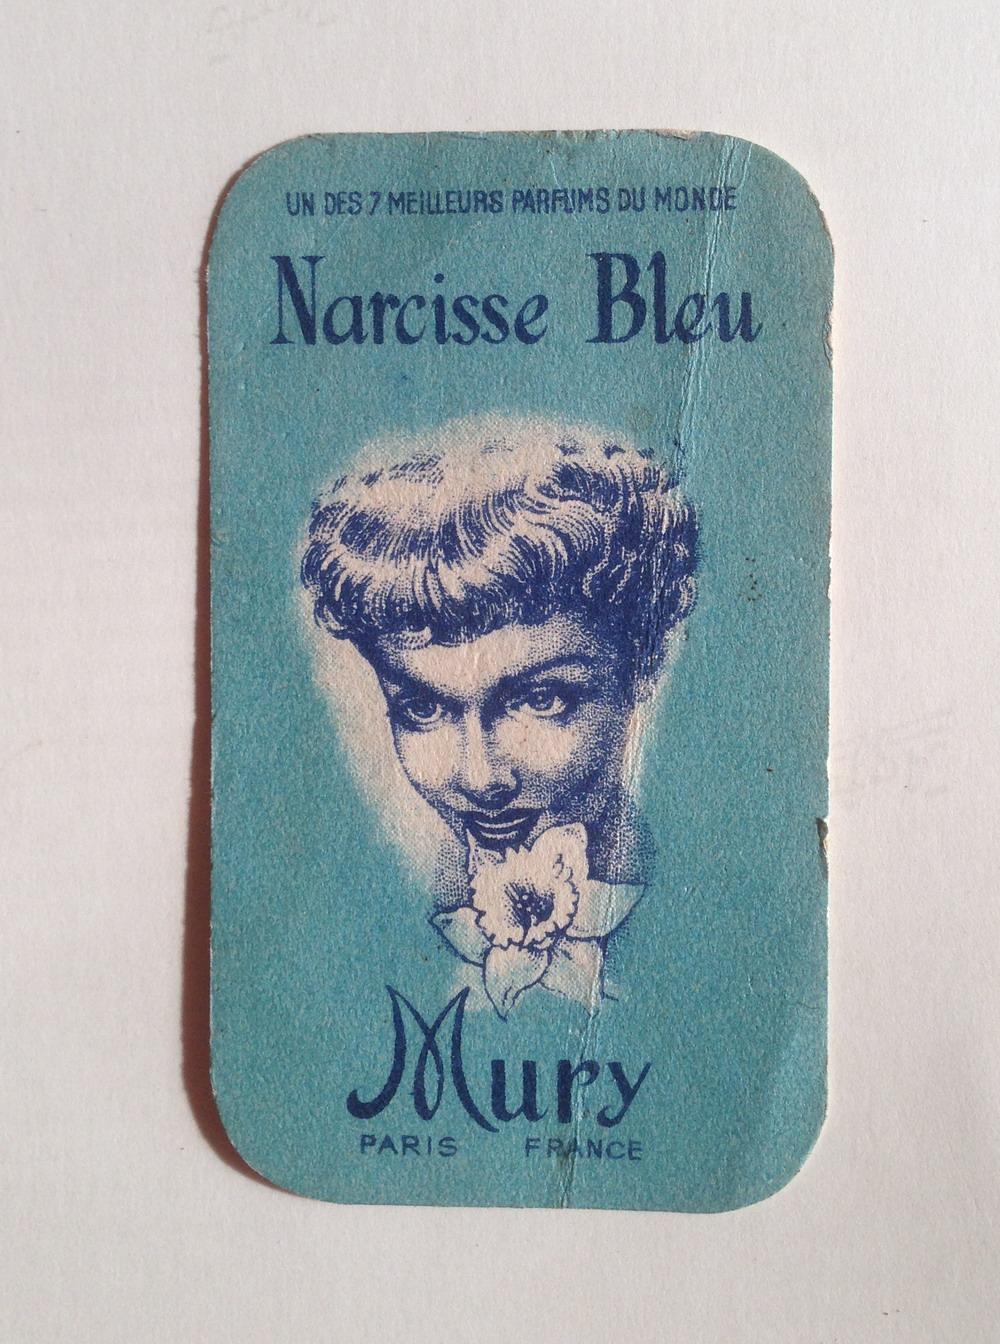 Mury - Perfume Card